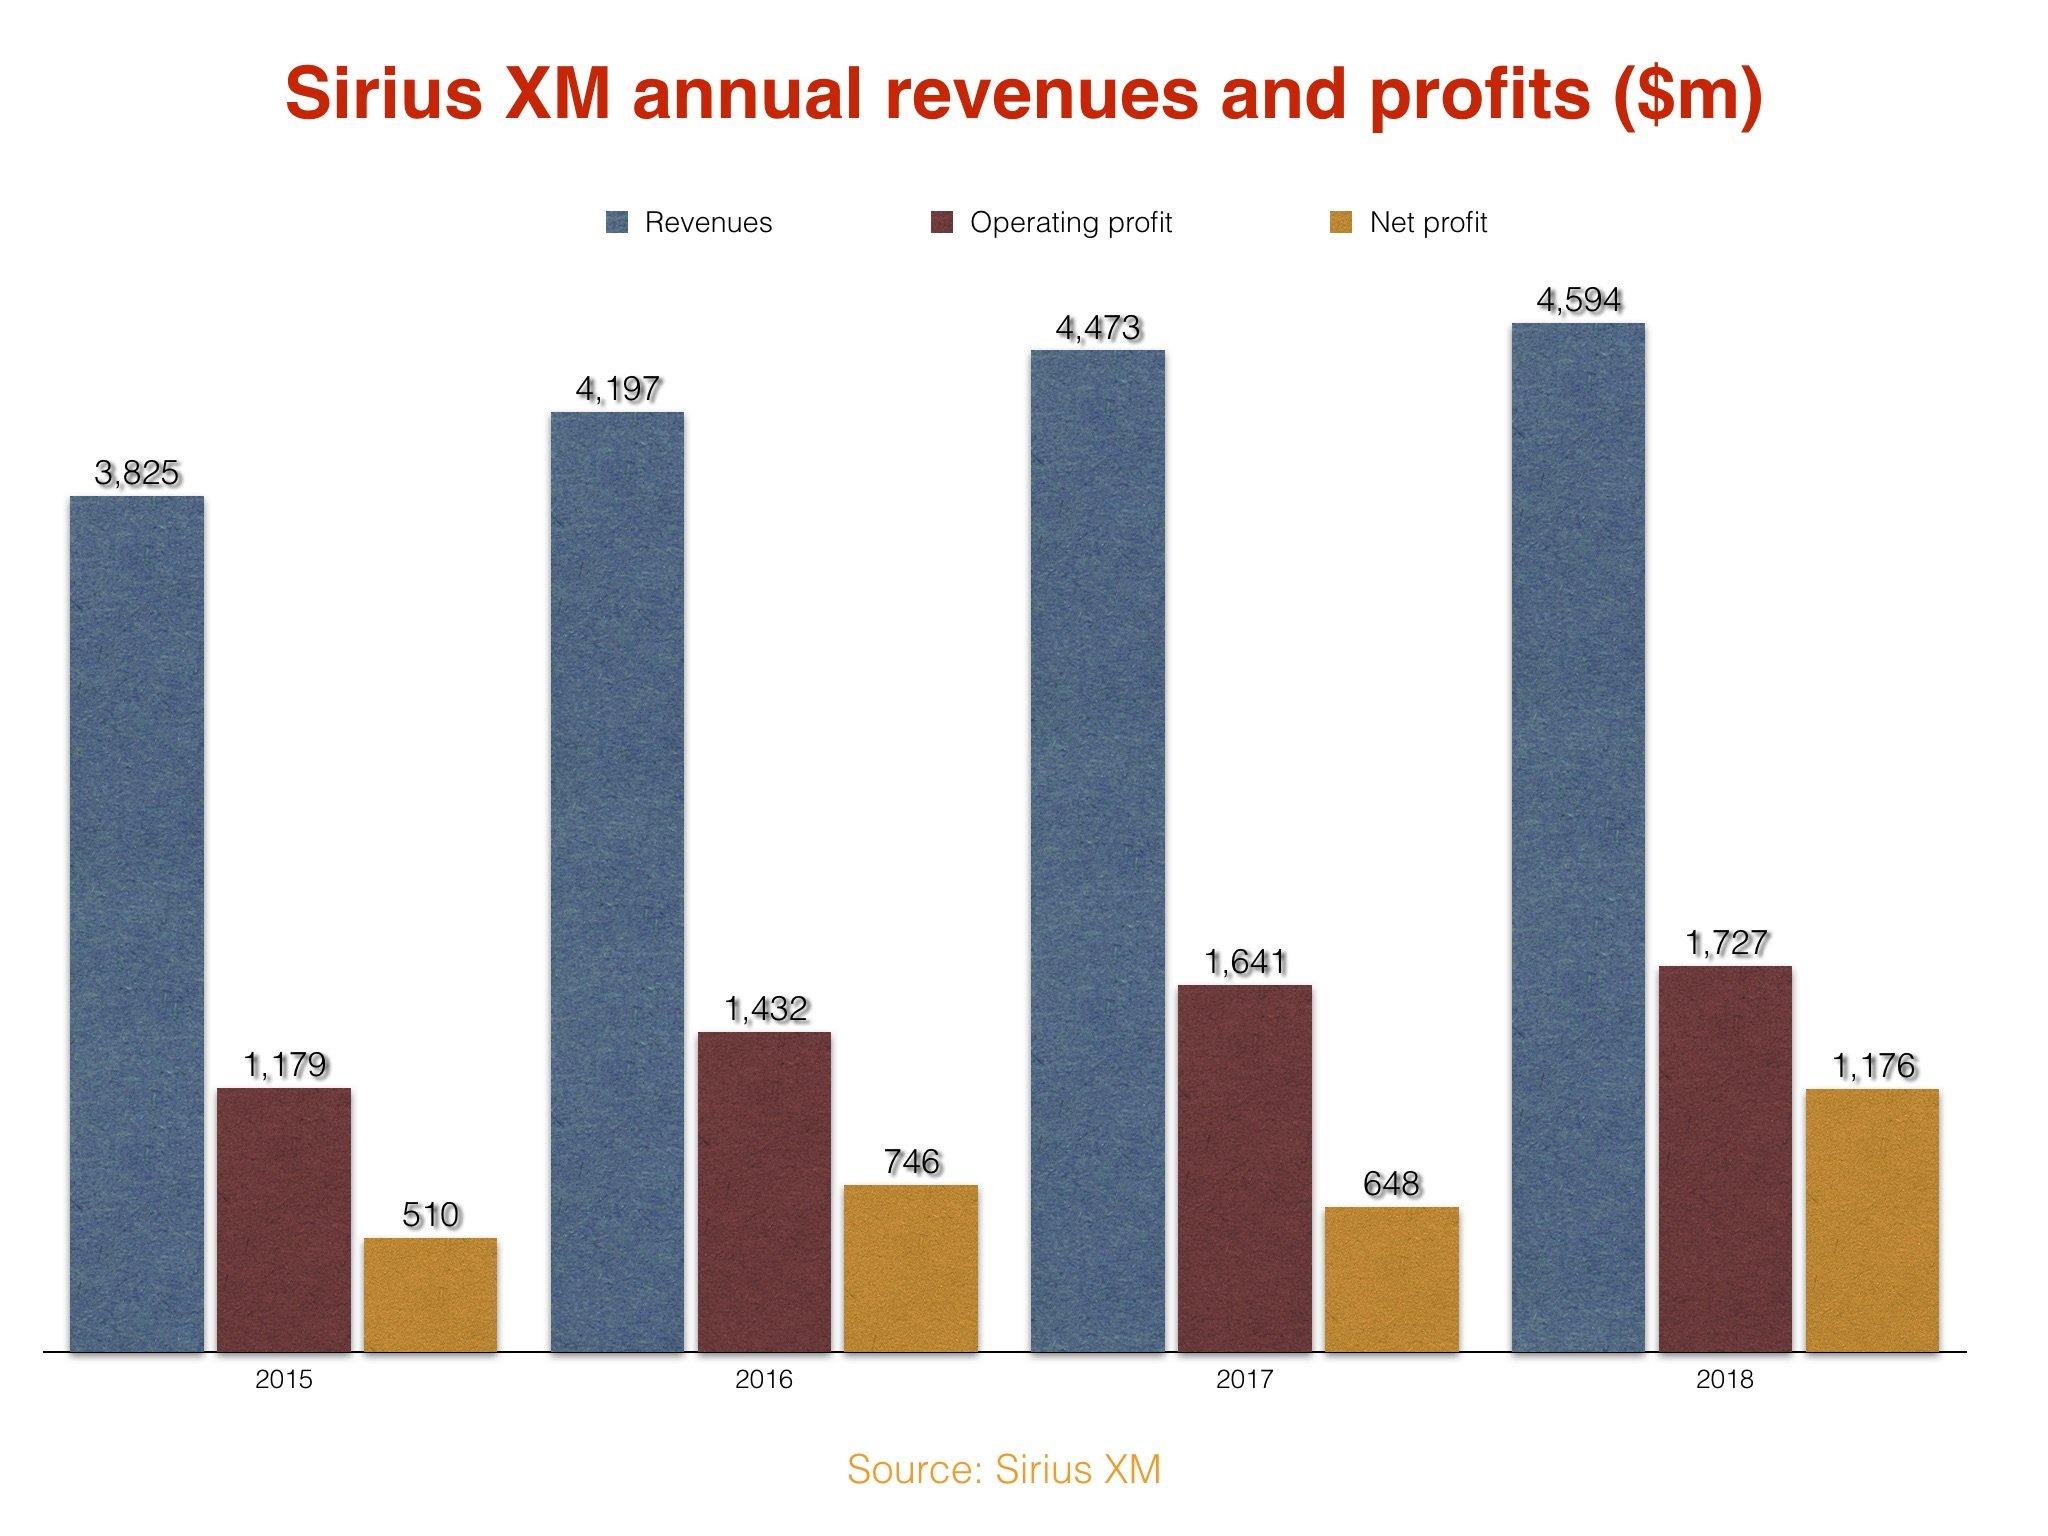 SiriusXM hits 34m subscribers, banks huge net profit of $1 2